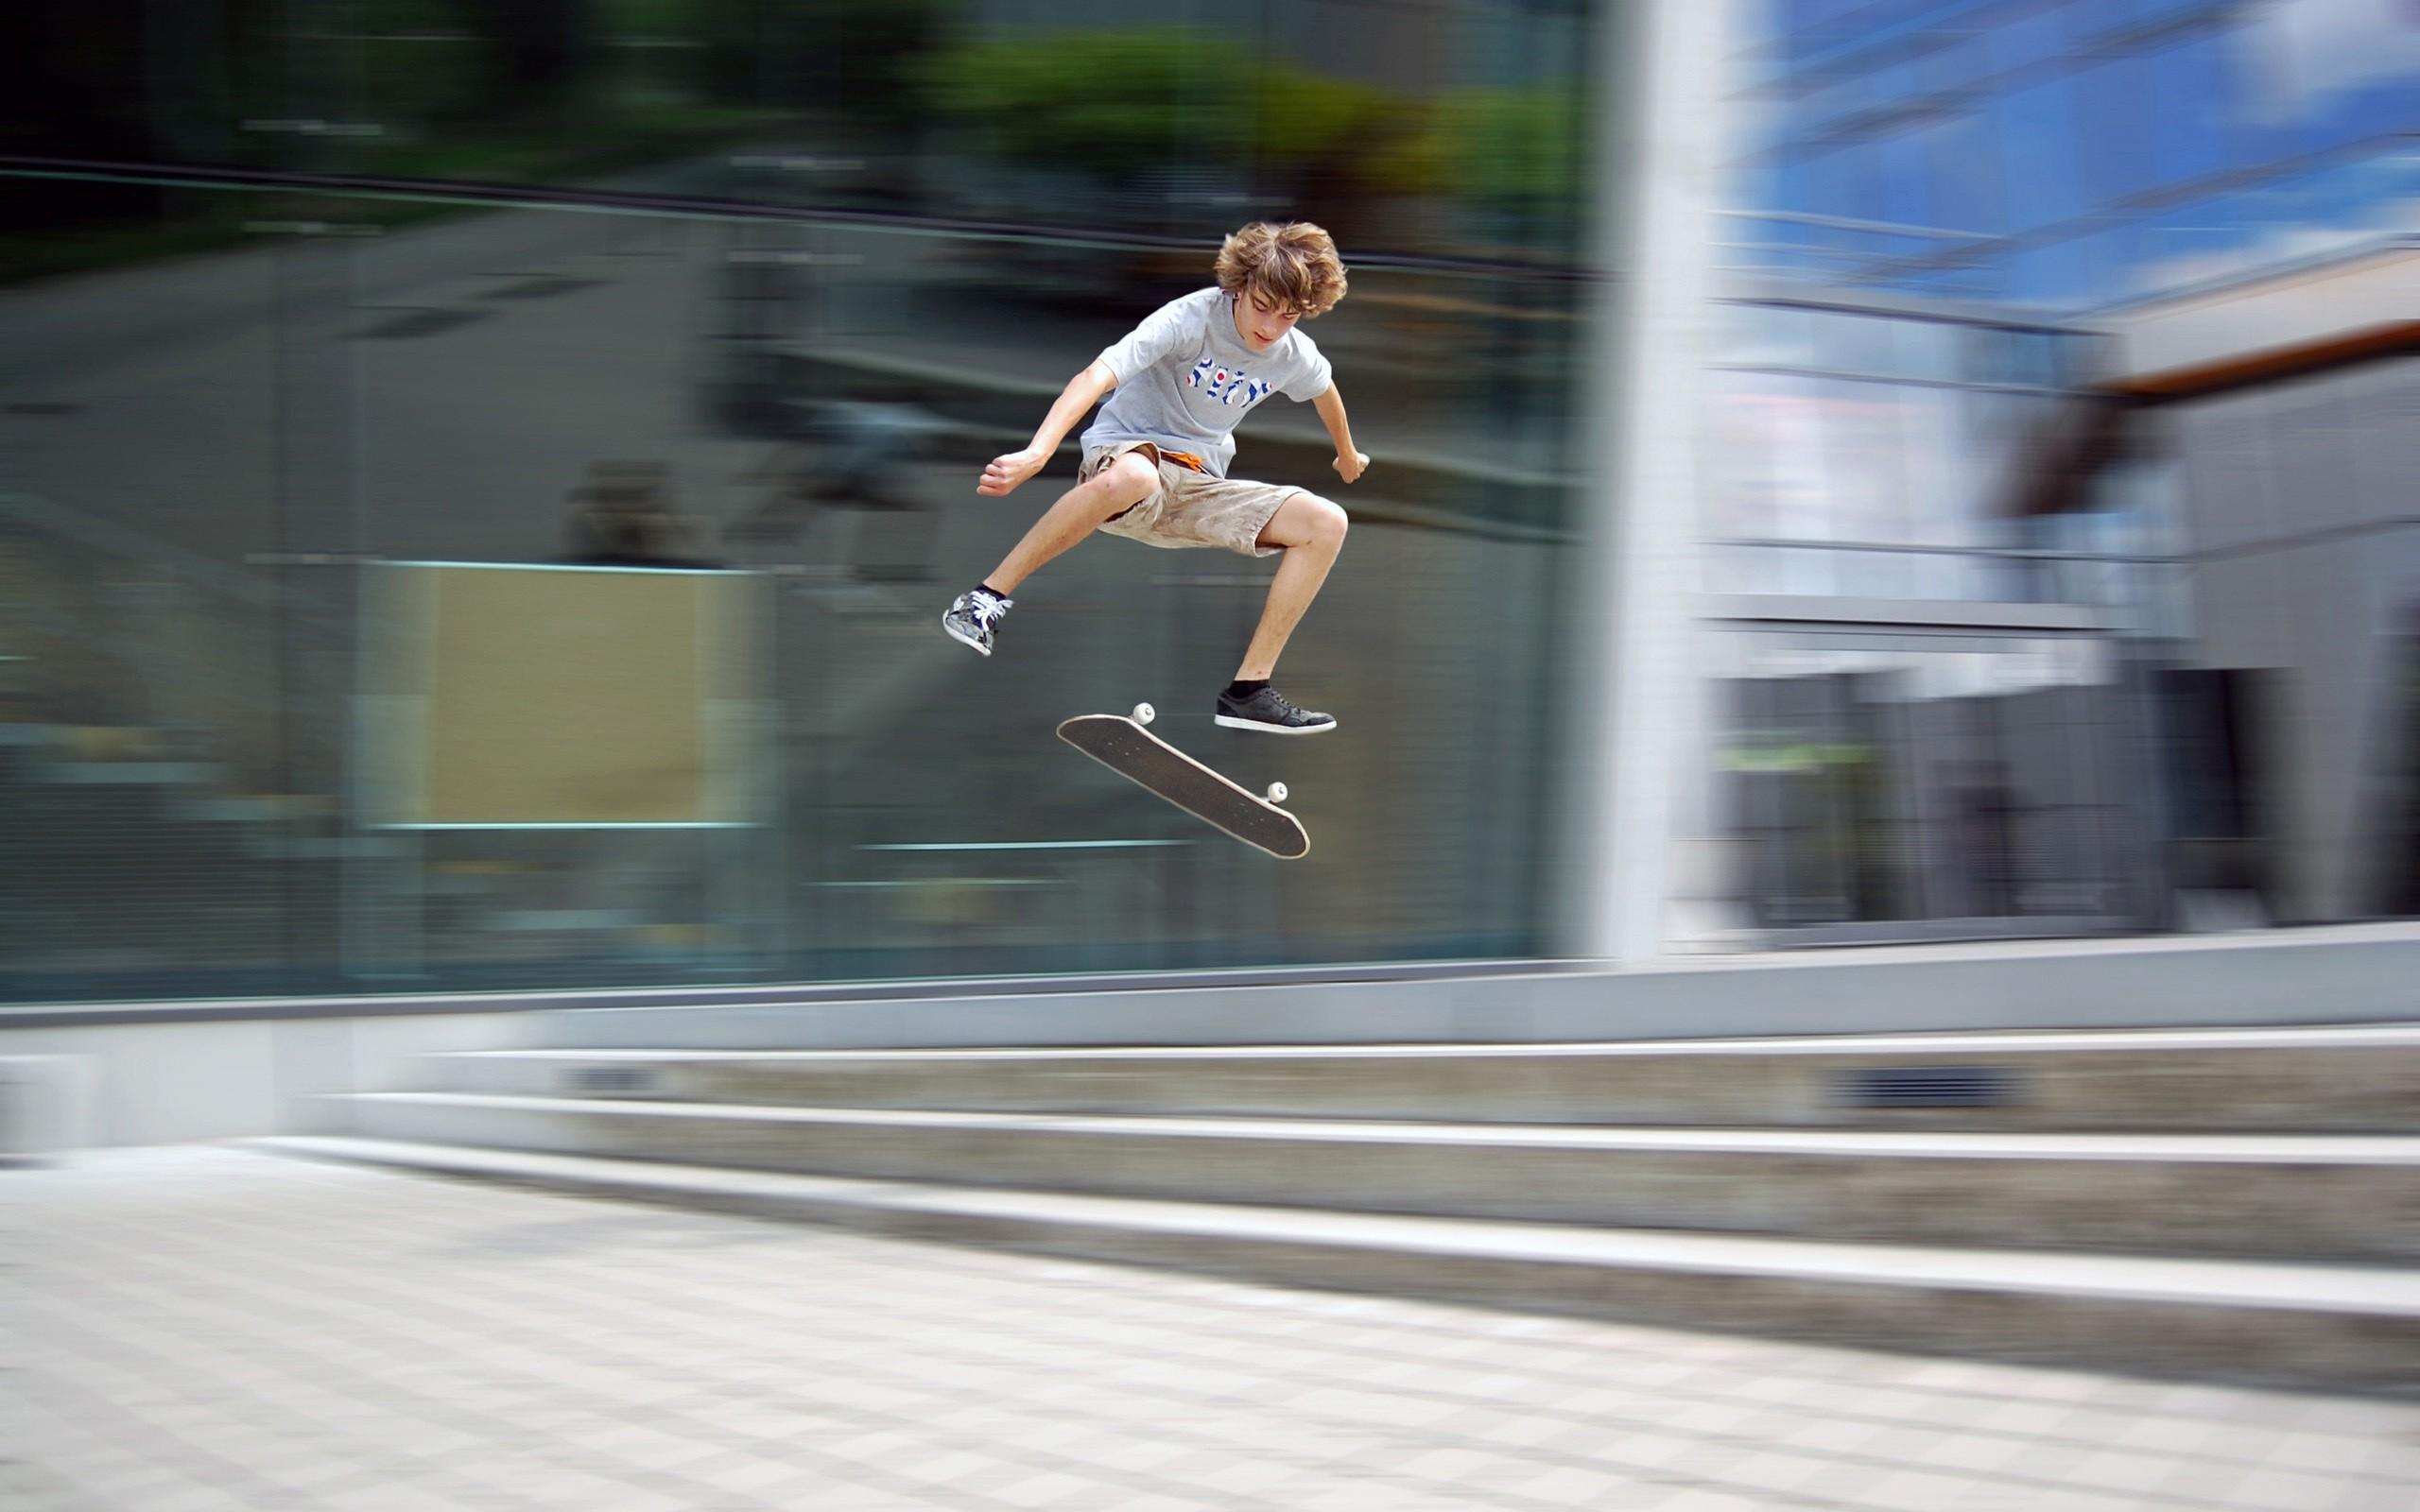 Skateboard Skills